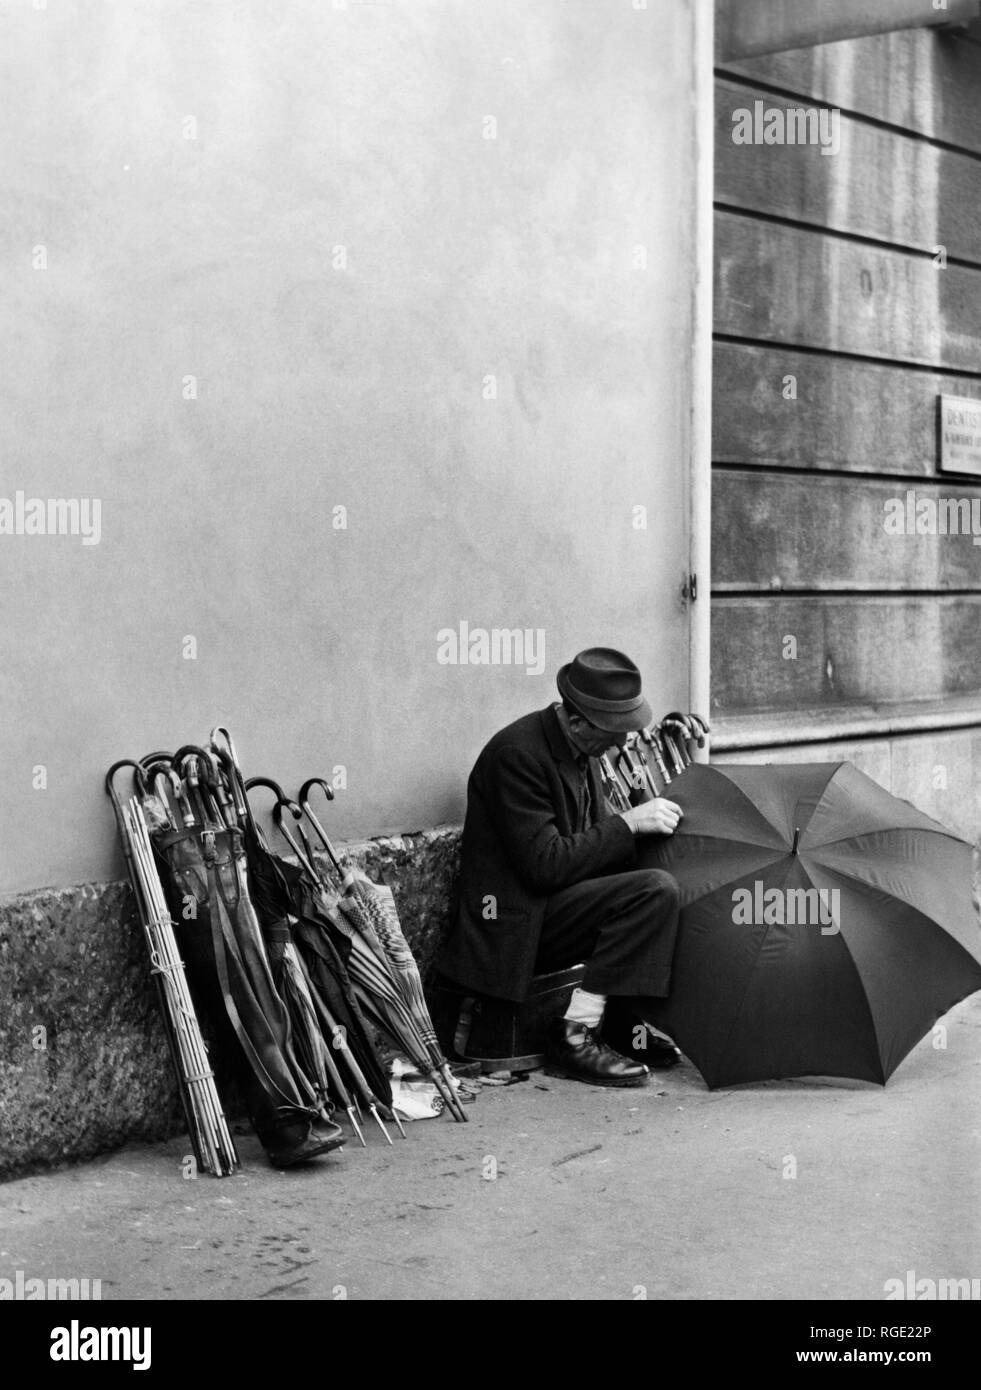 milano, corso magenta, walking repairer of umbrellas, 1960 - Stock Image